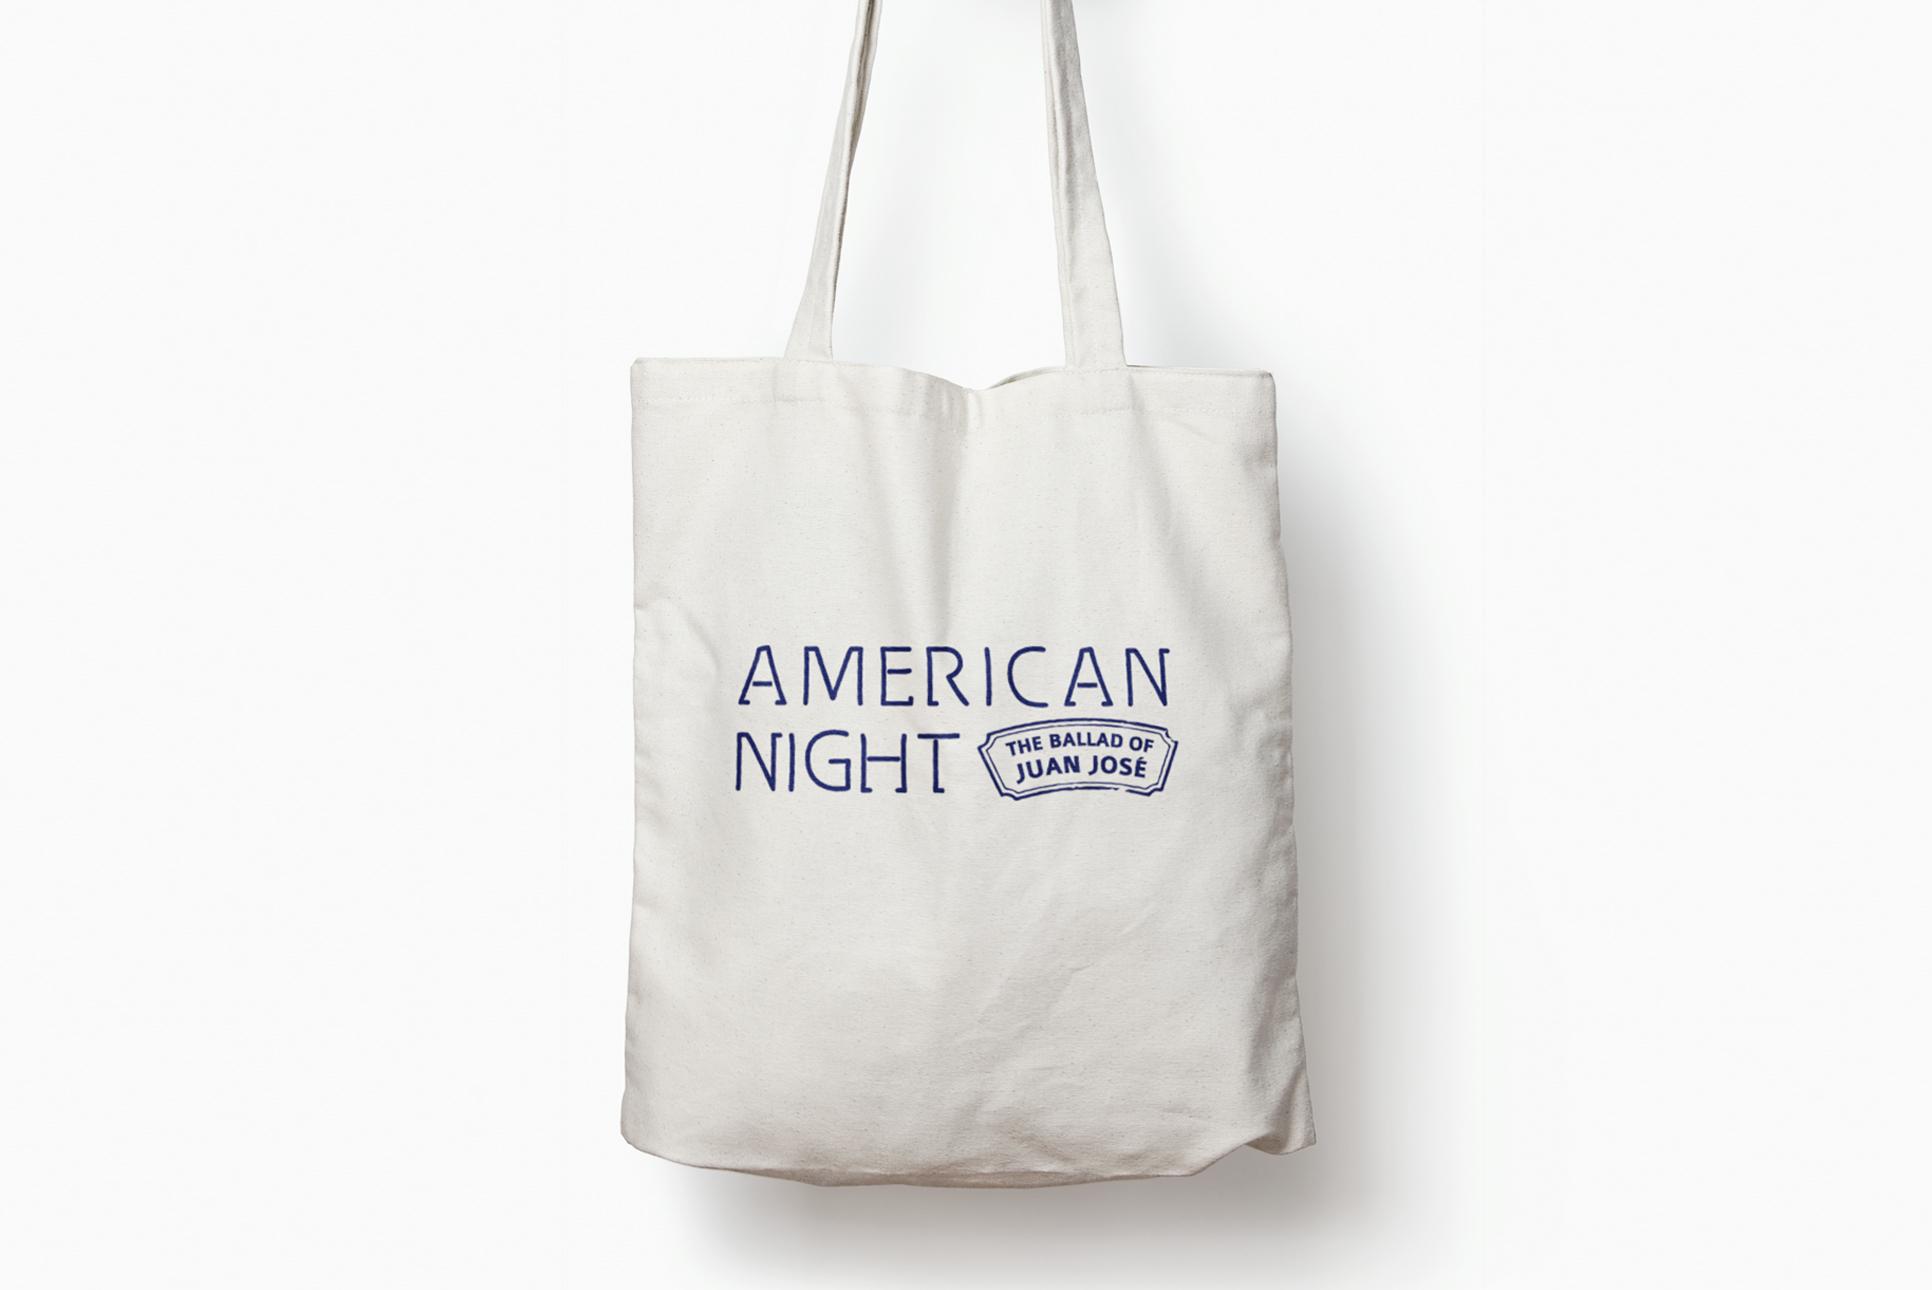 Tote bag with logo design for world premiere of American Night in Orinda, California.